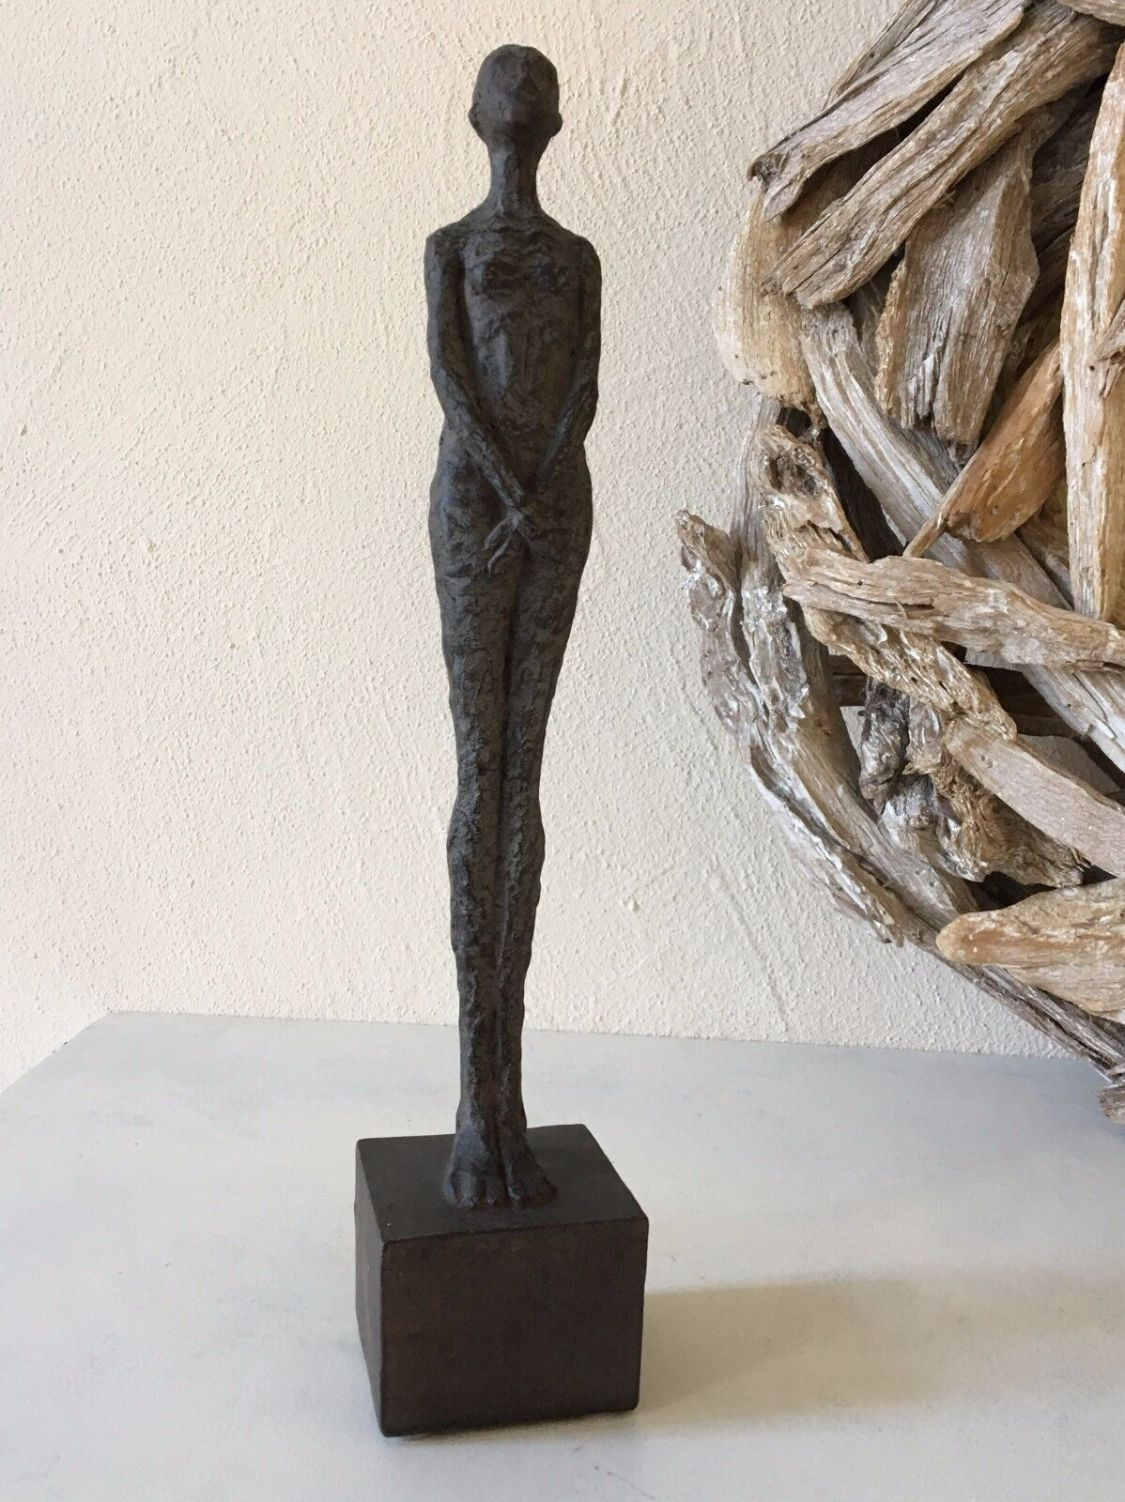 Frauenskulptur Bronze Antik Skulptur nackte Frau Dekofigur moderne Kunst 32 cm